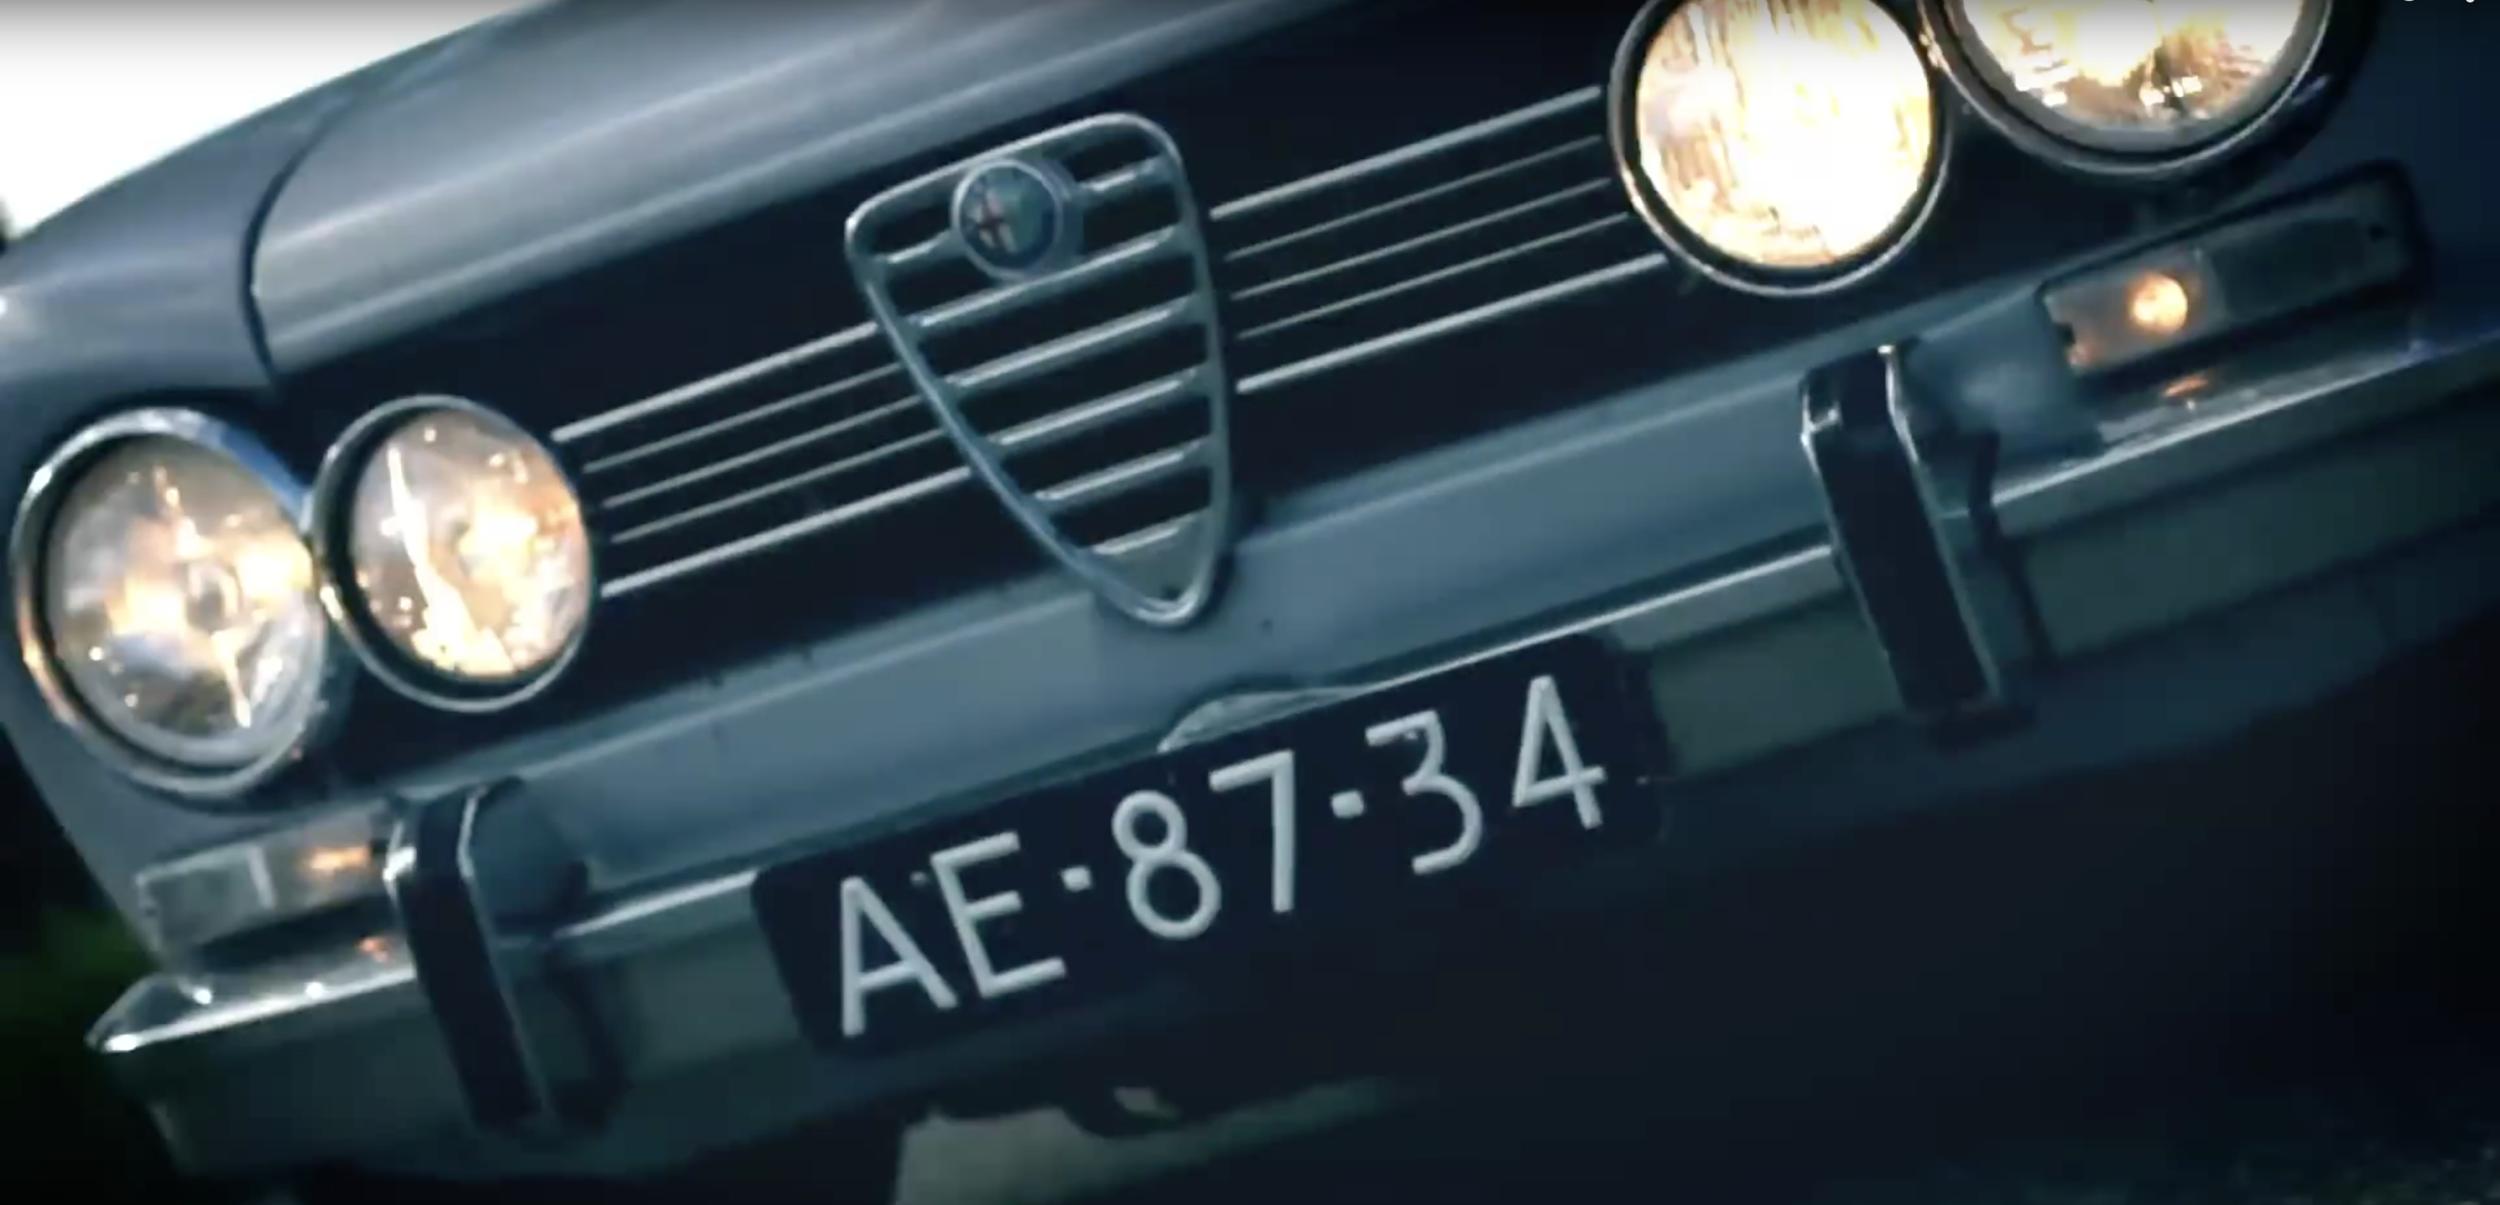 Our very first car film (2012) — Robbert Alblas